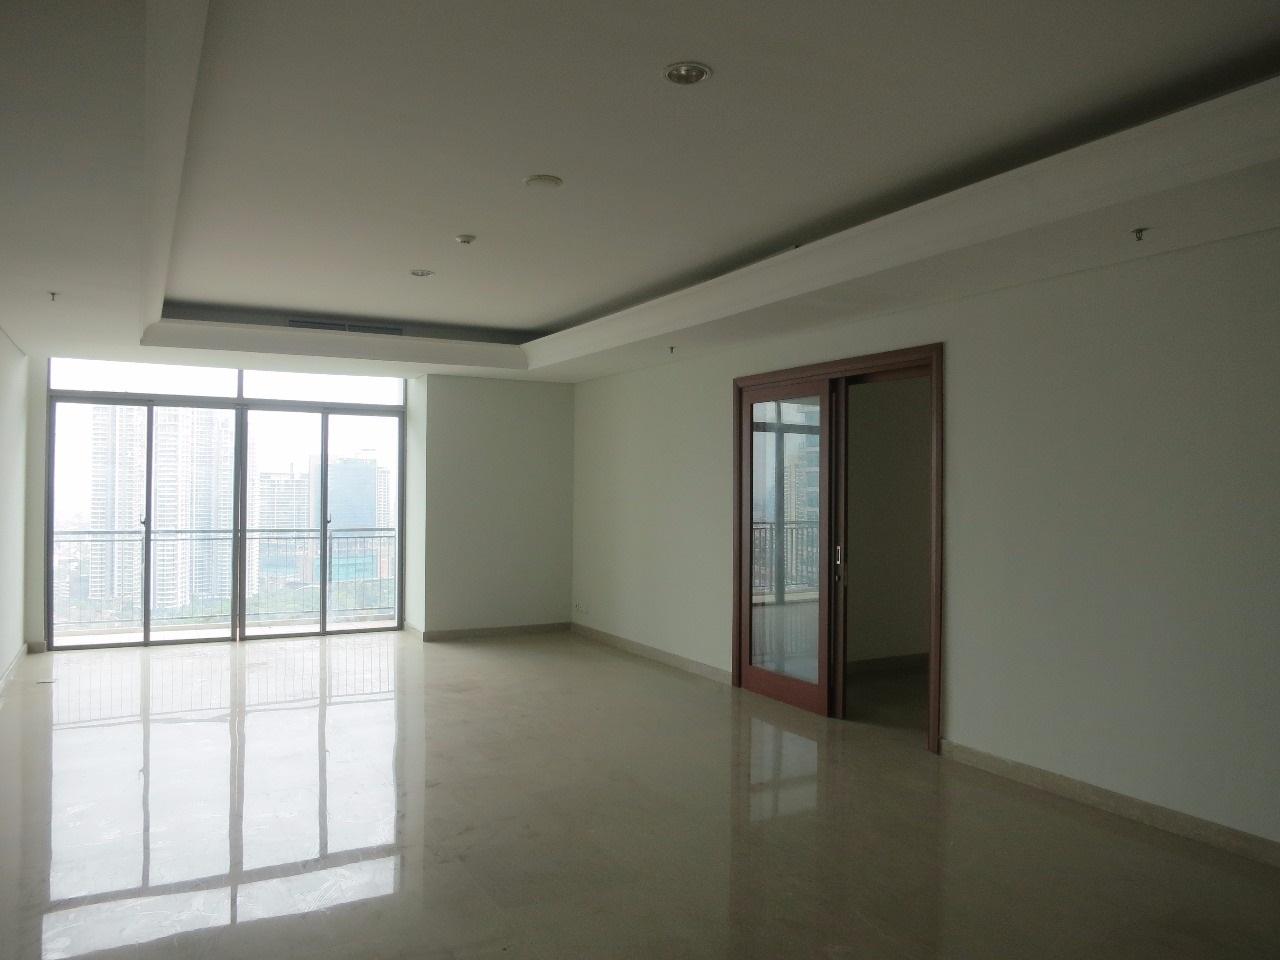 Apartemen di Essence Dharmawangsa, South Tower, High Floor, 3+1 Bedrooms, Private Lift, Semi Furnished